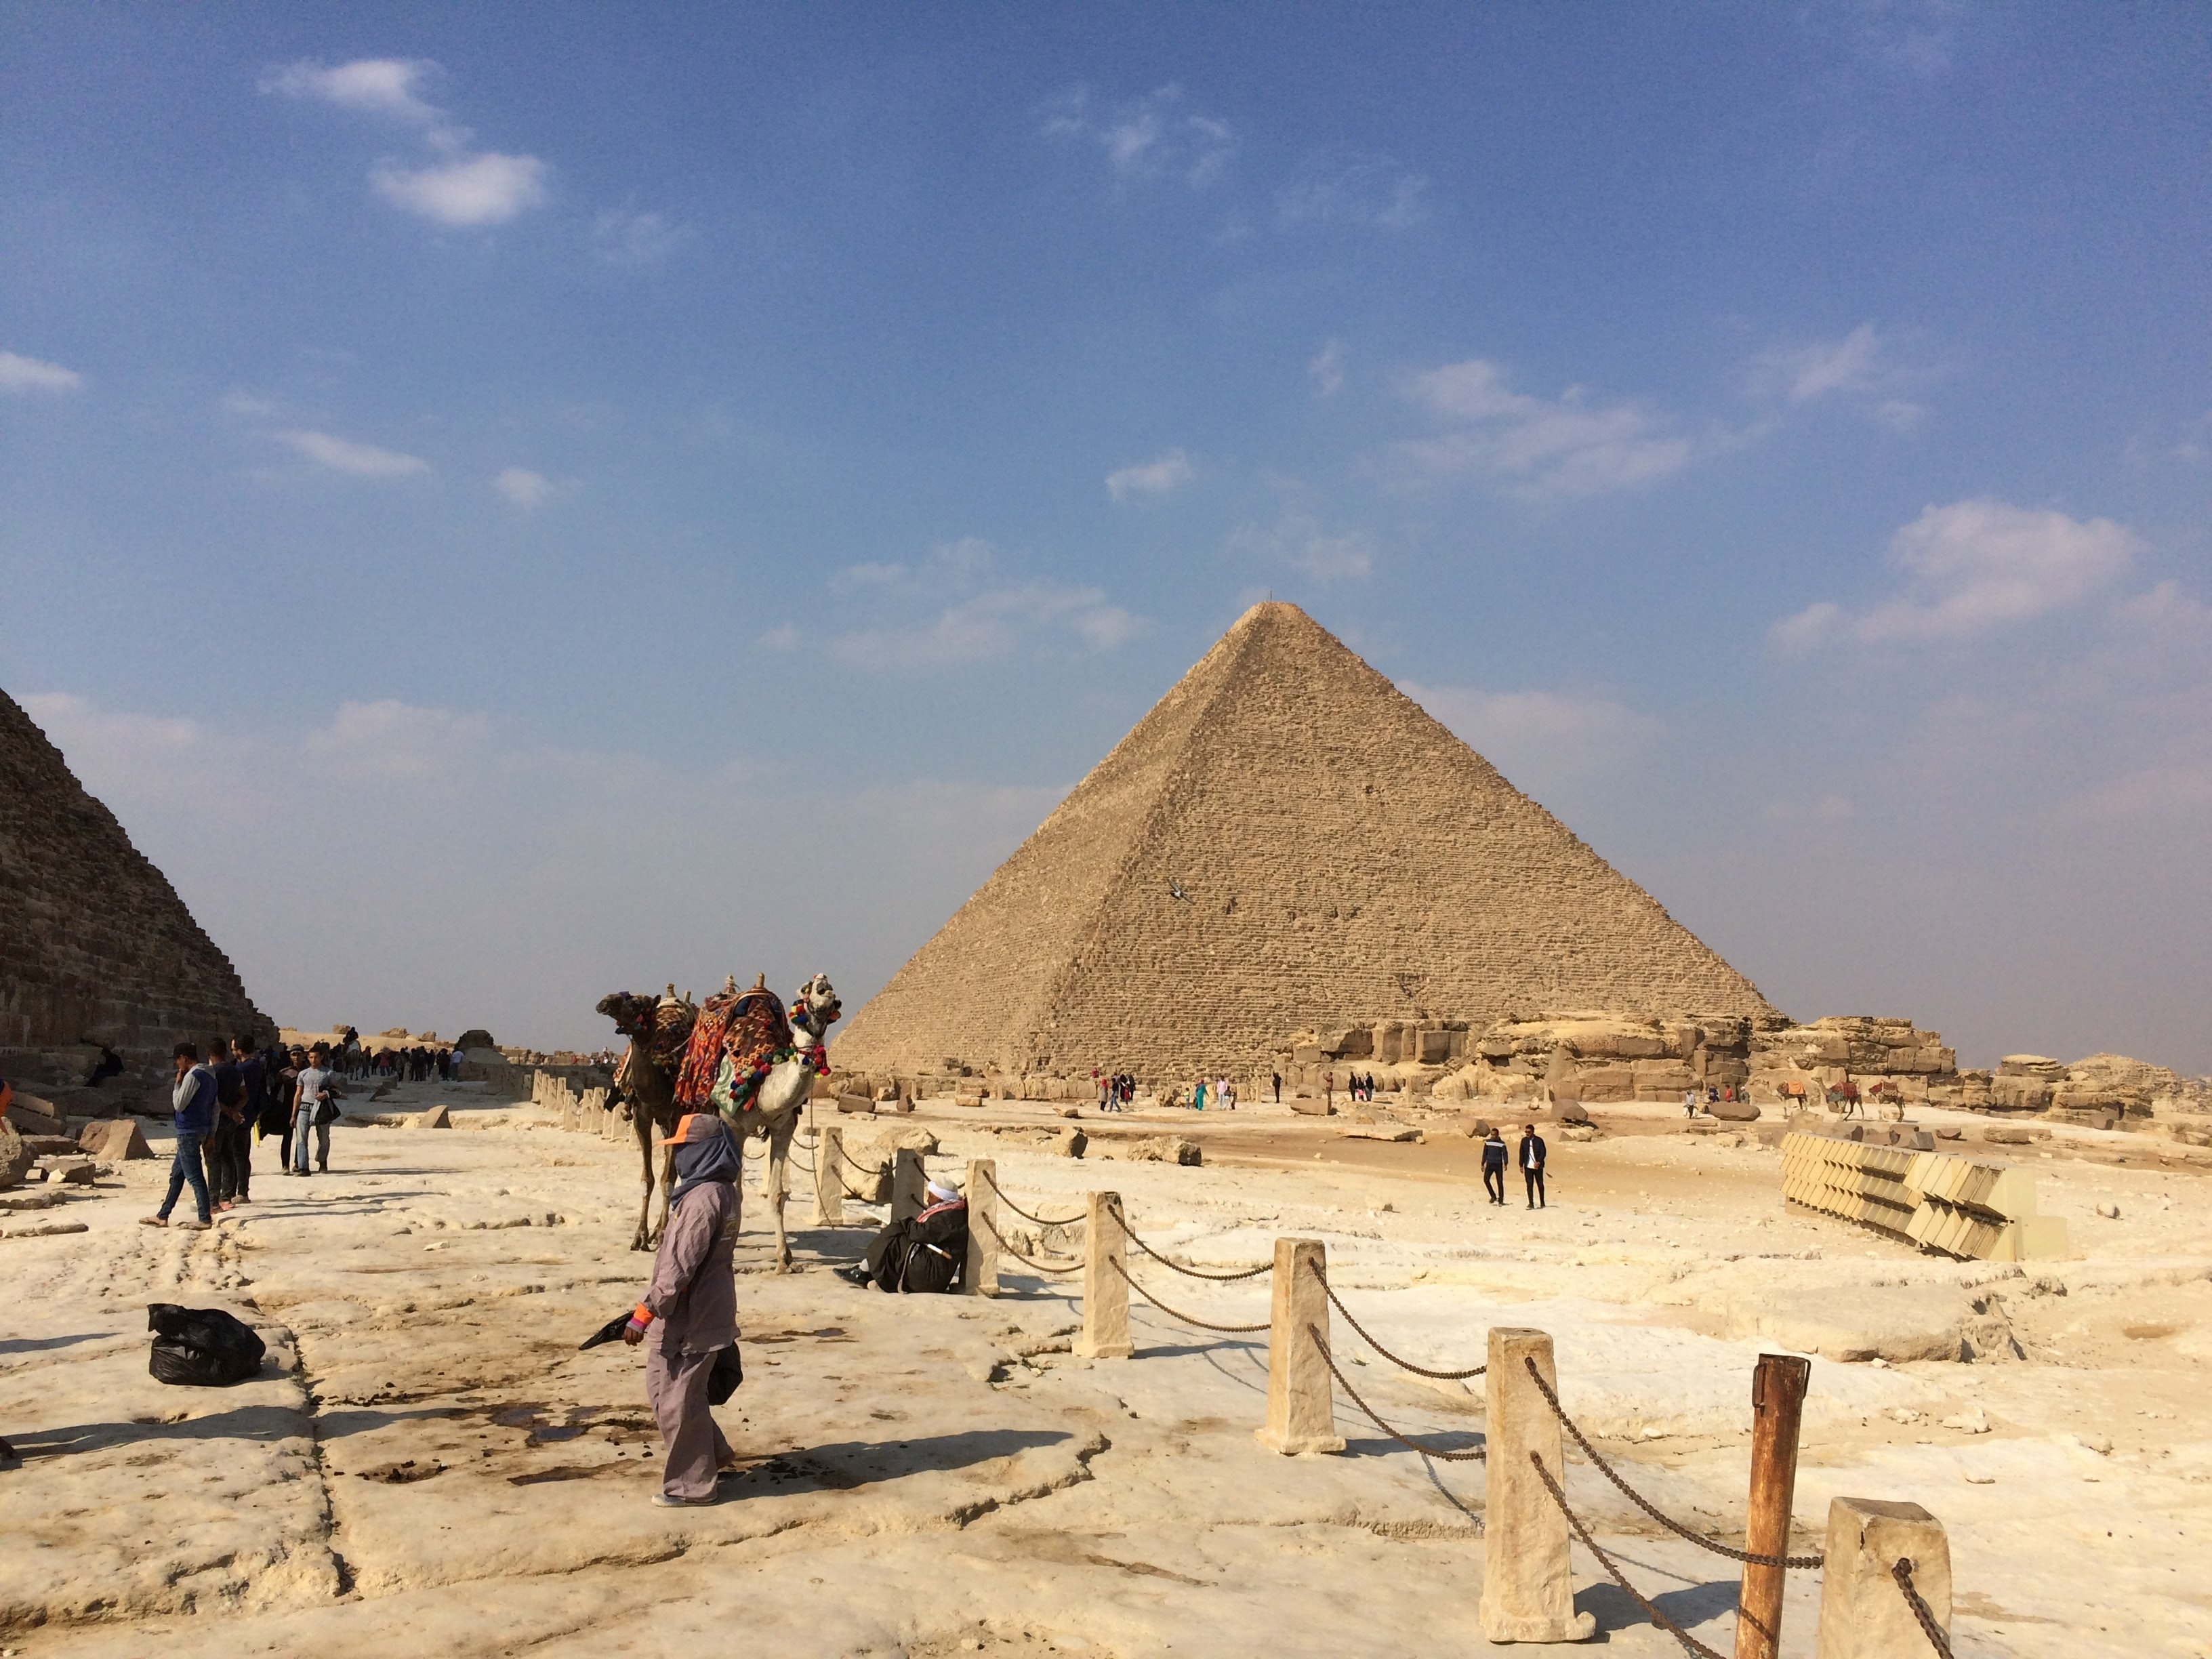 Tourists explore the pyramid ruins in Giza